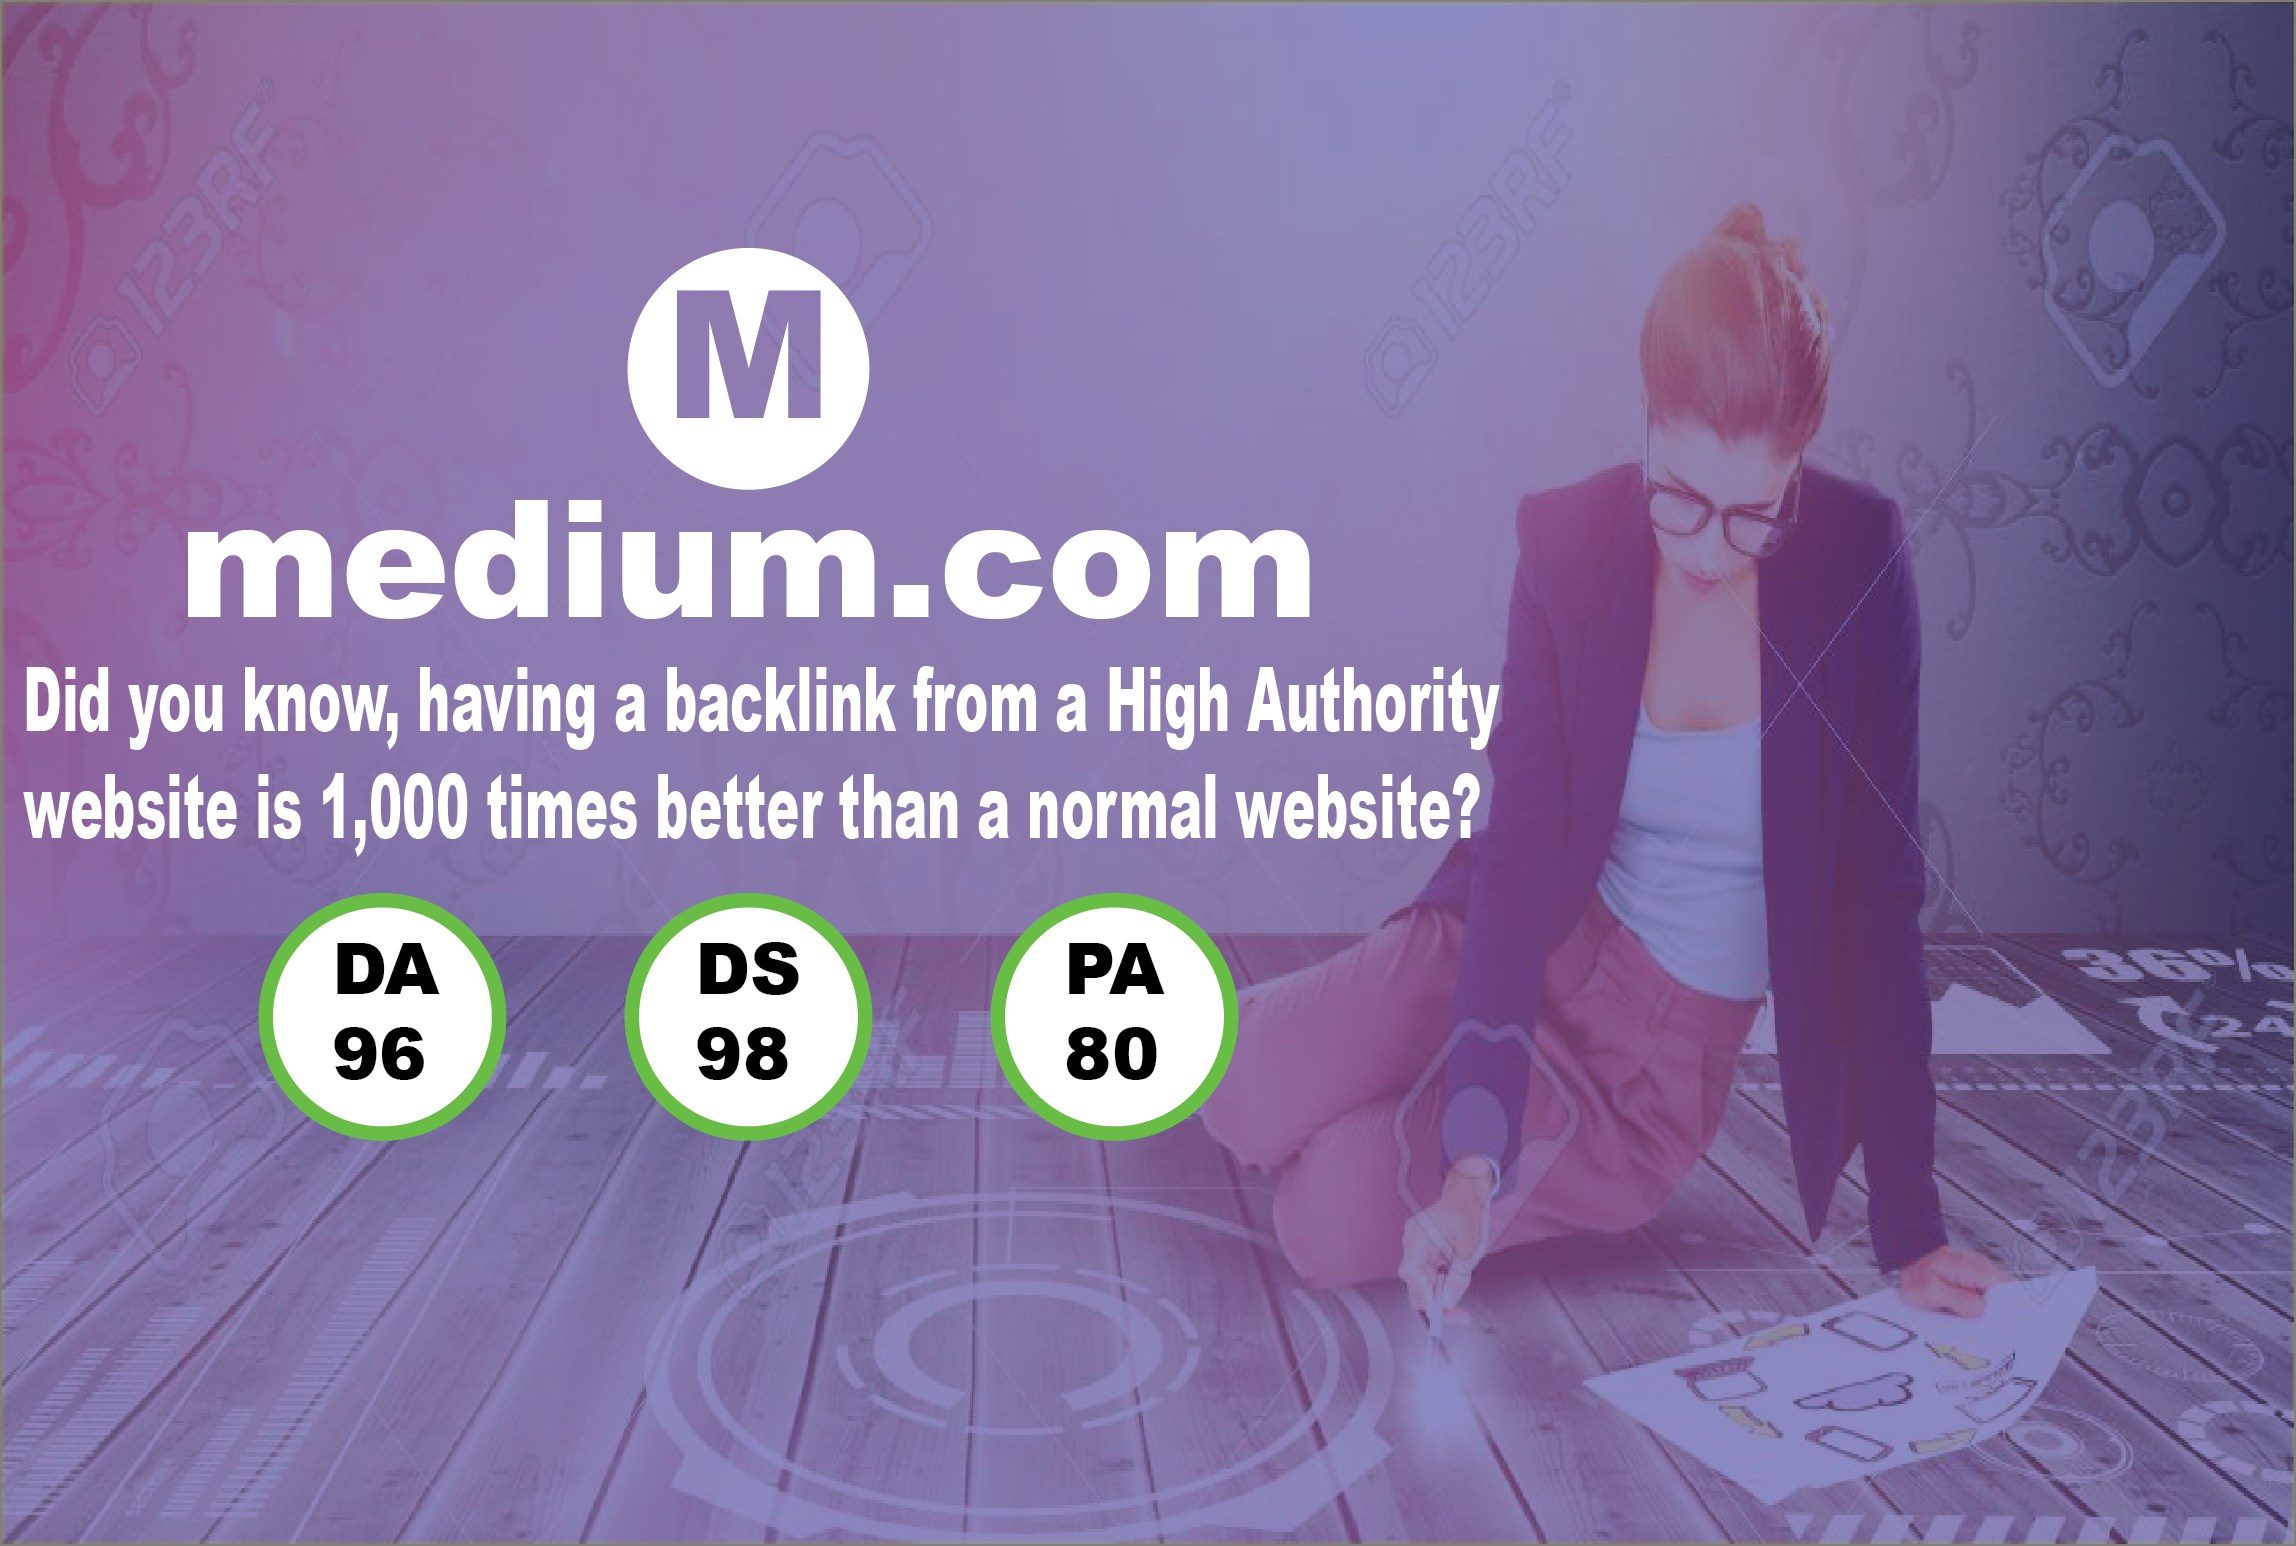 I will write and publish a guest post on Medium. com DA 96